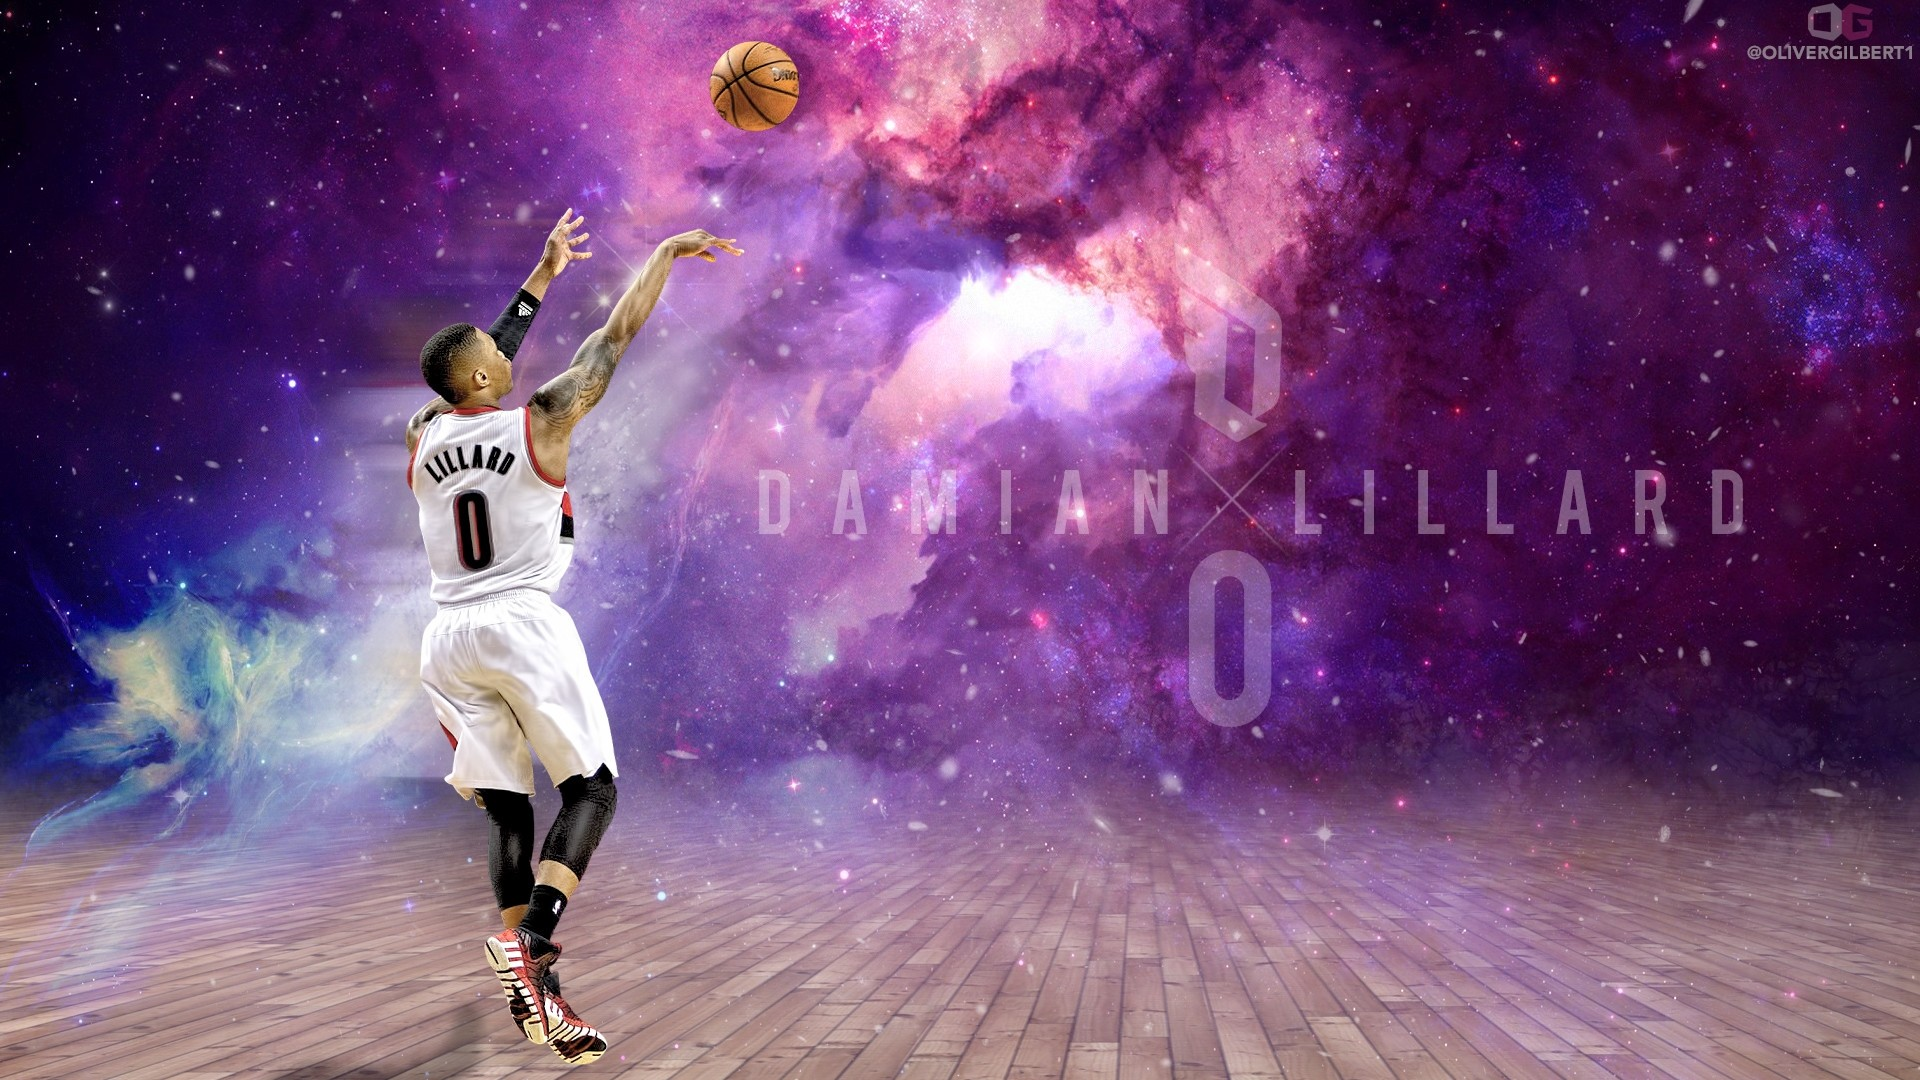 Damian Lillard Background